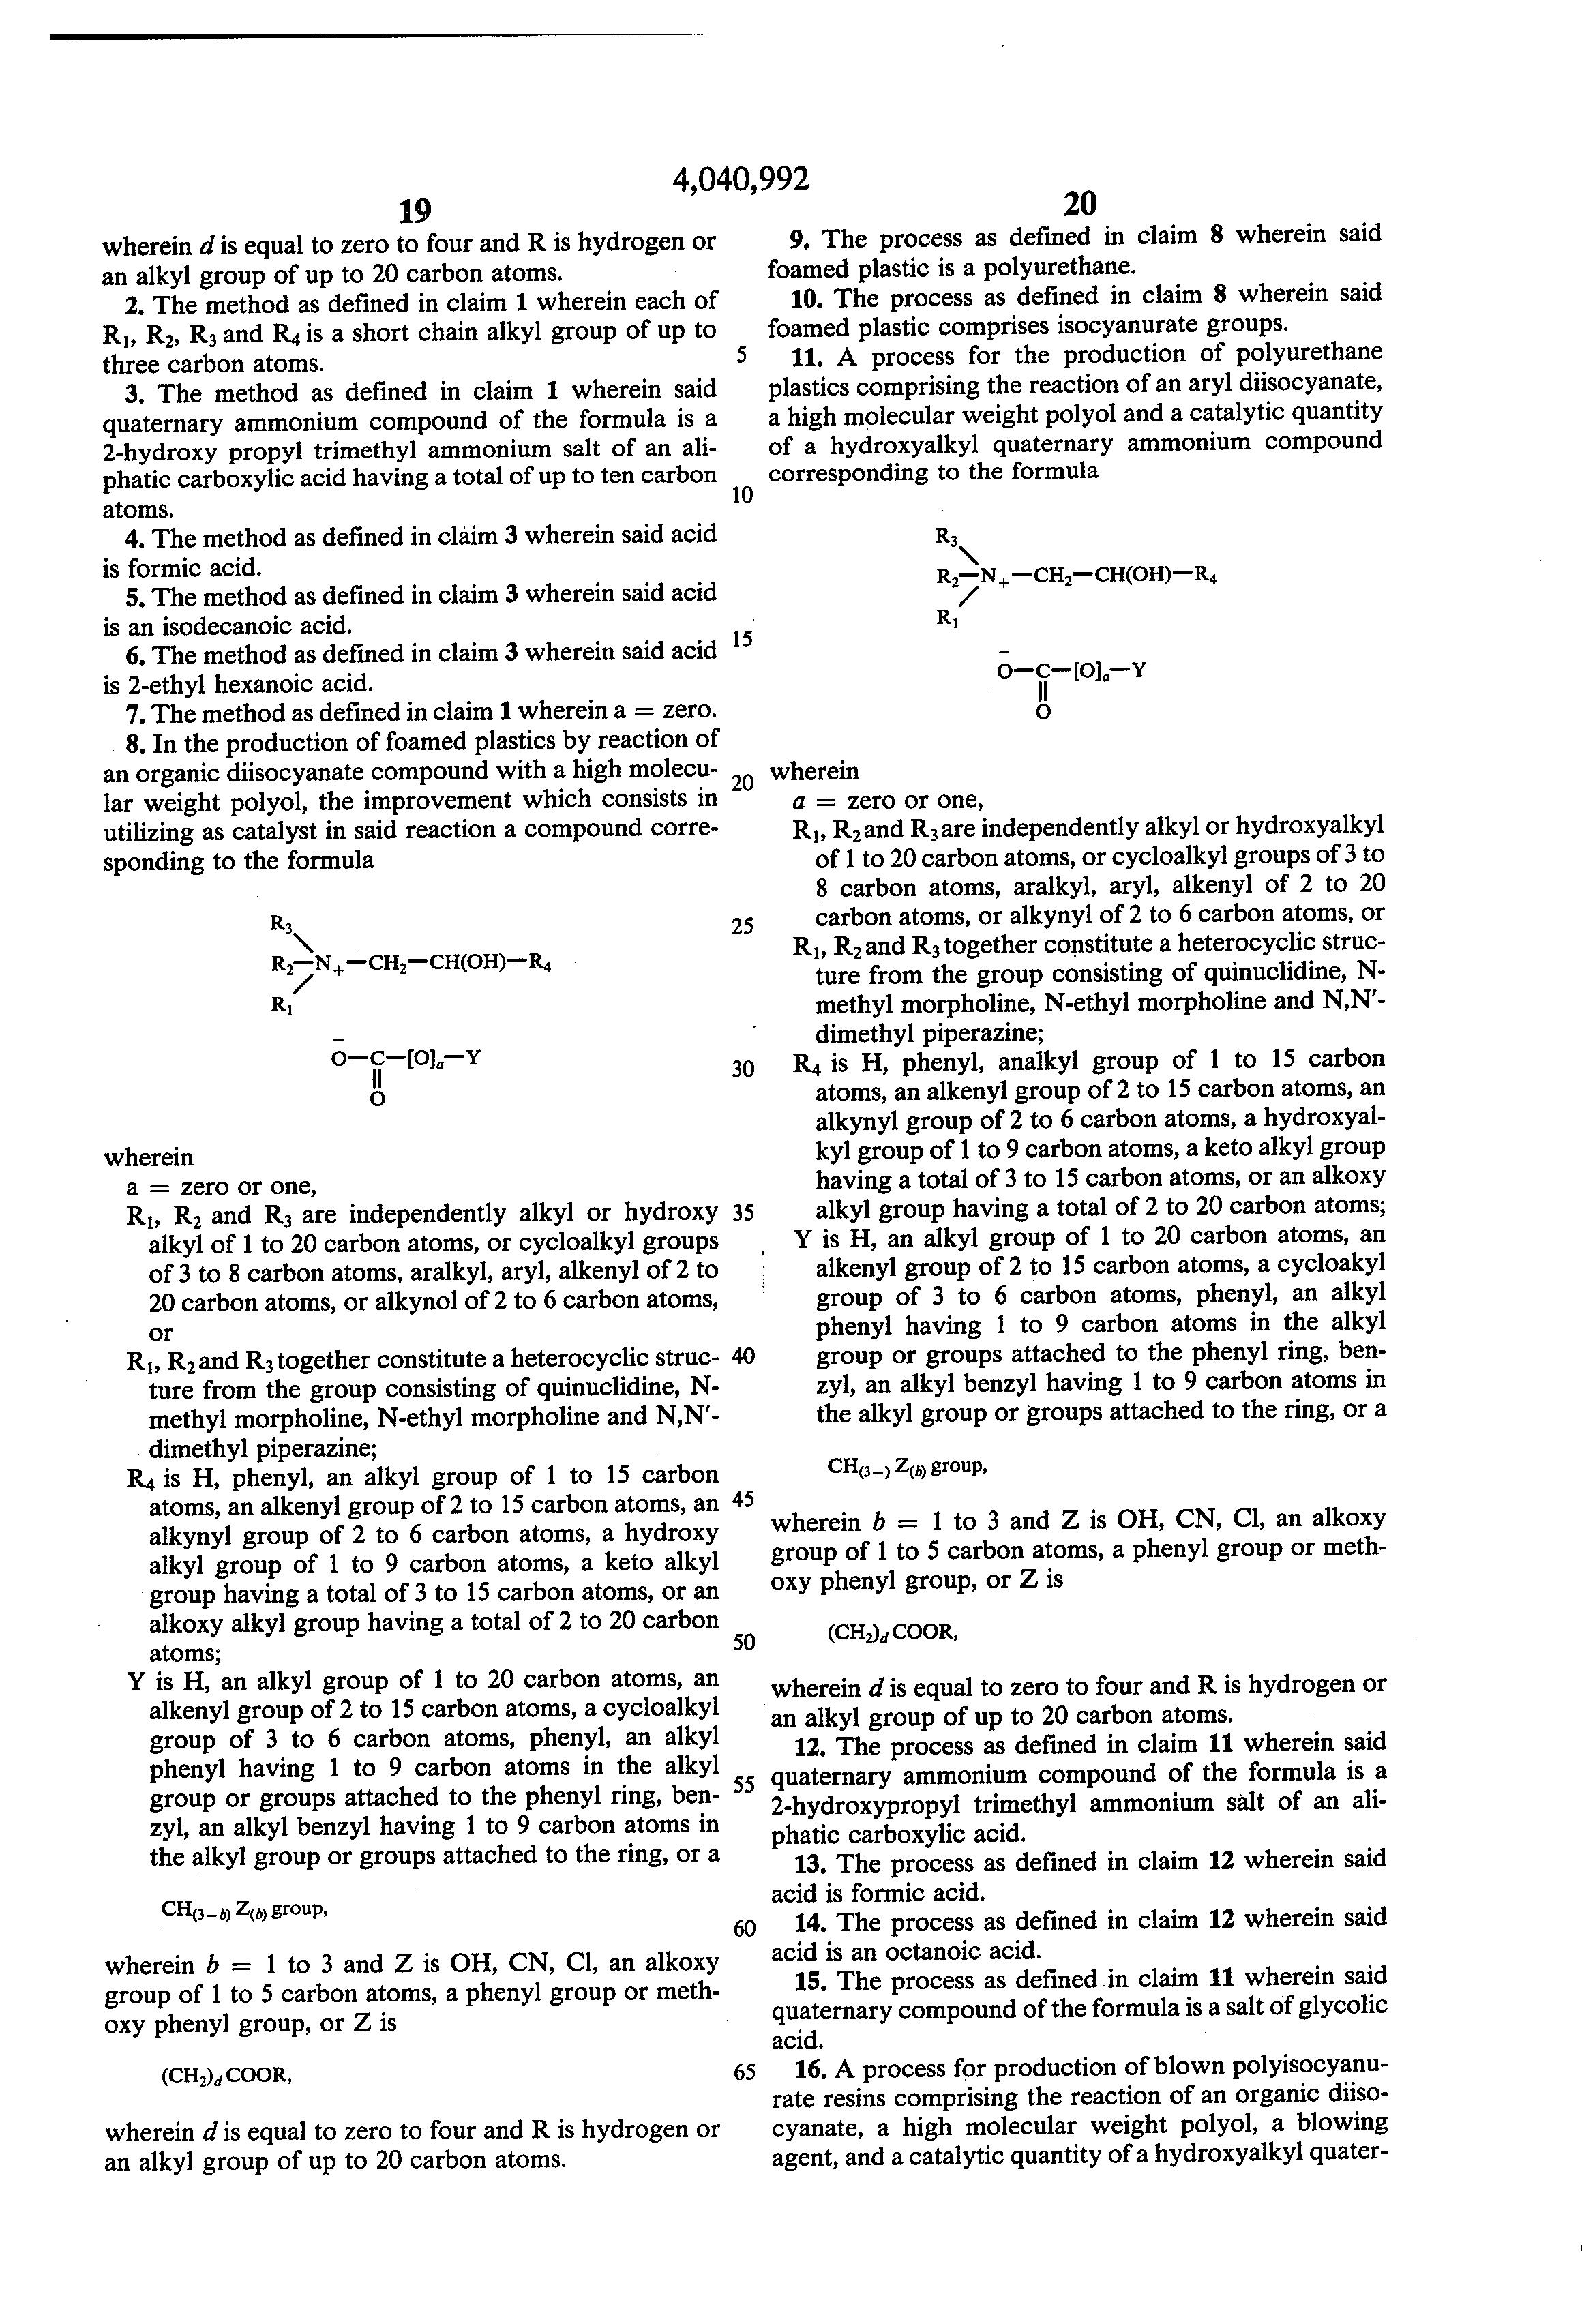 pdf The secret life of